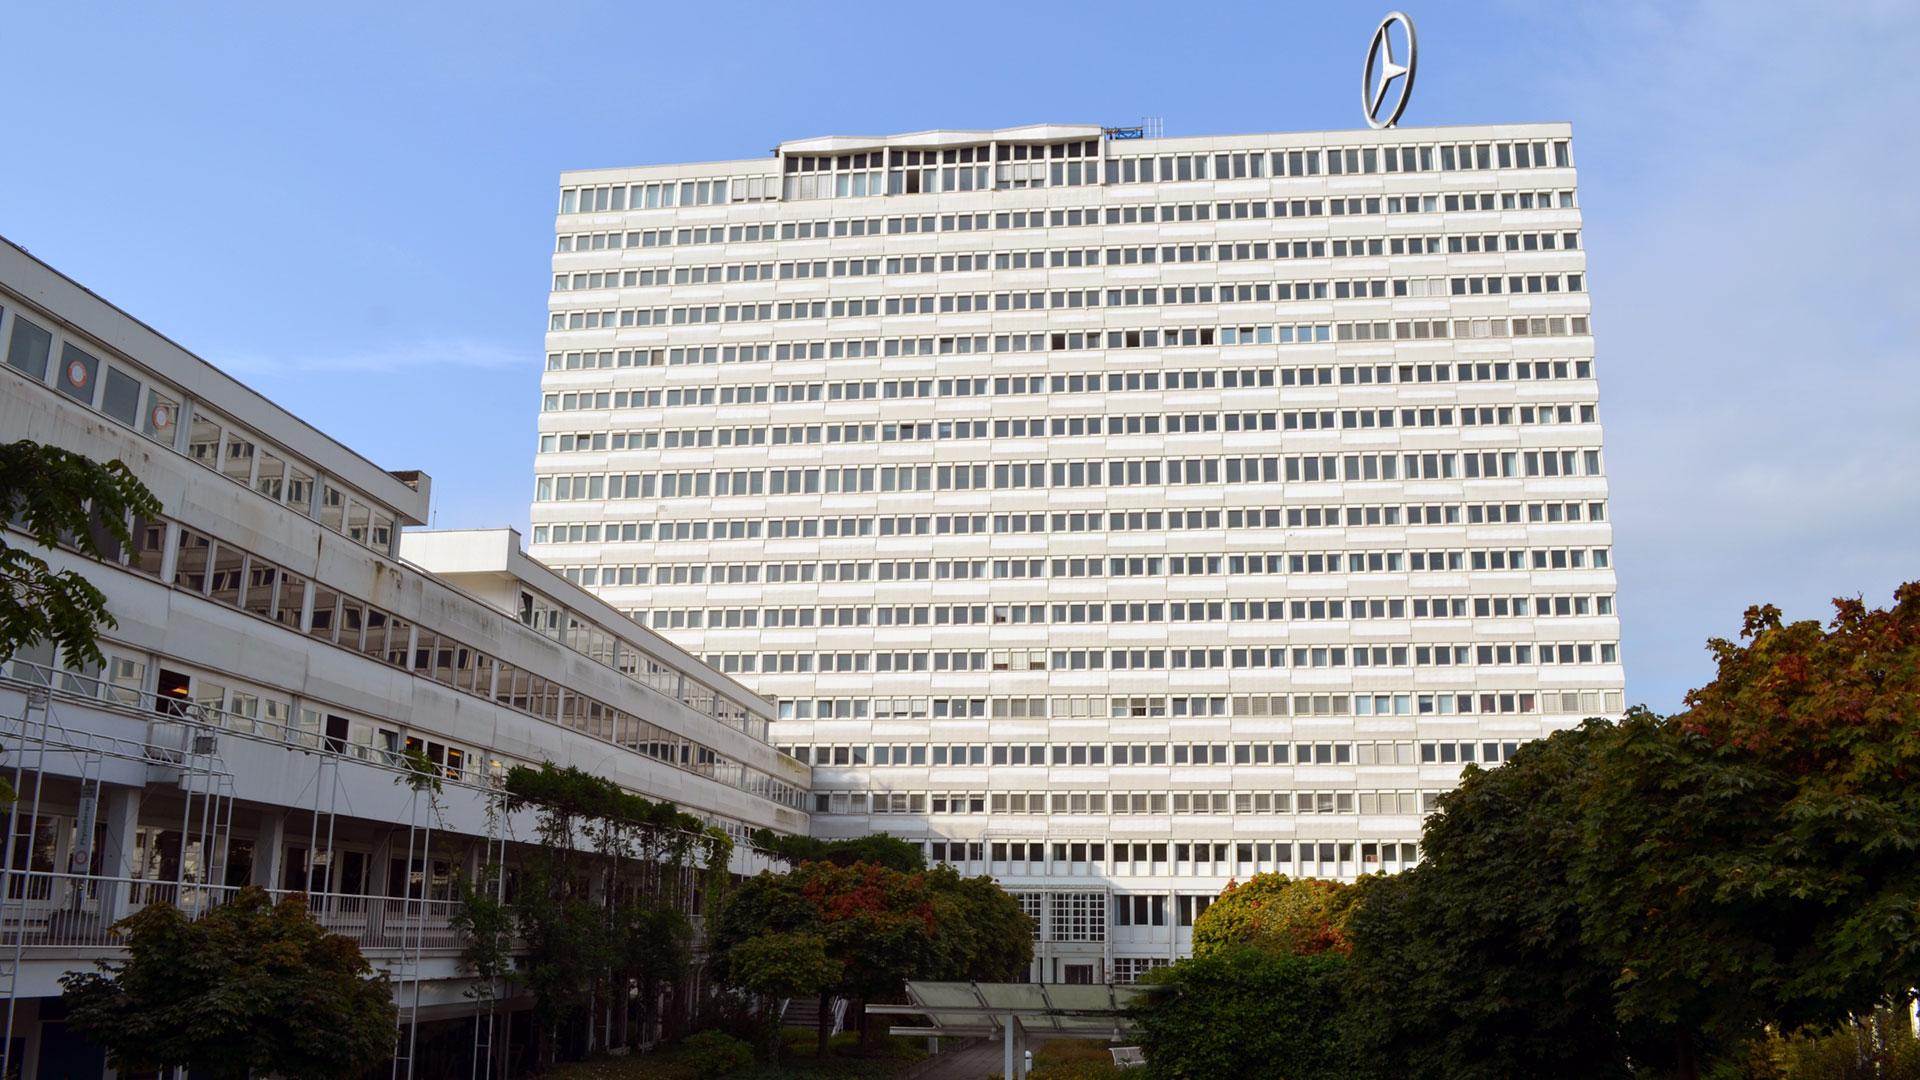 Bonn Center